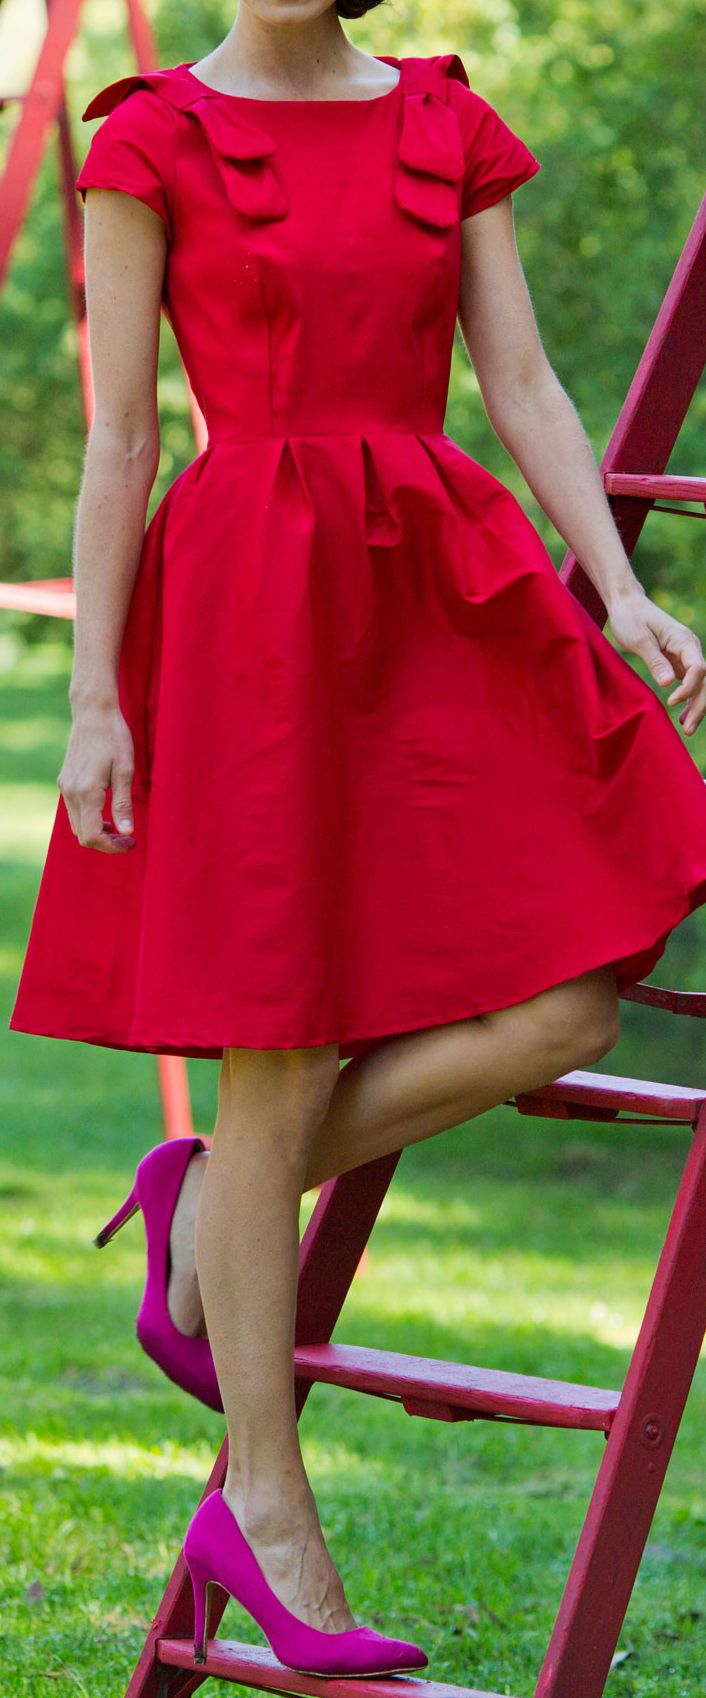 fur parka Scarlet swing dress  Lovely dresses and flirty skirts